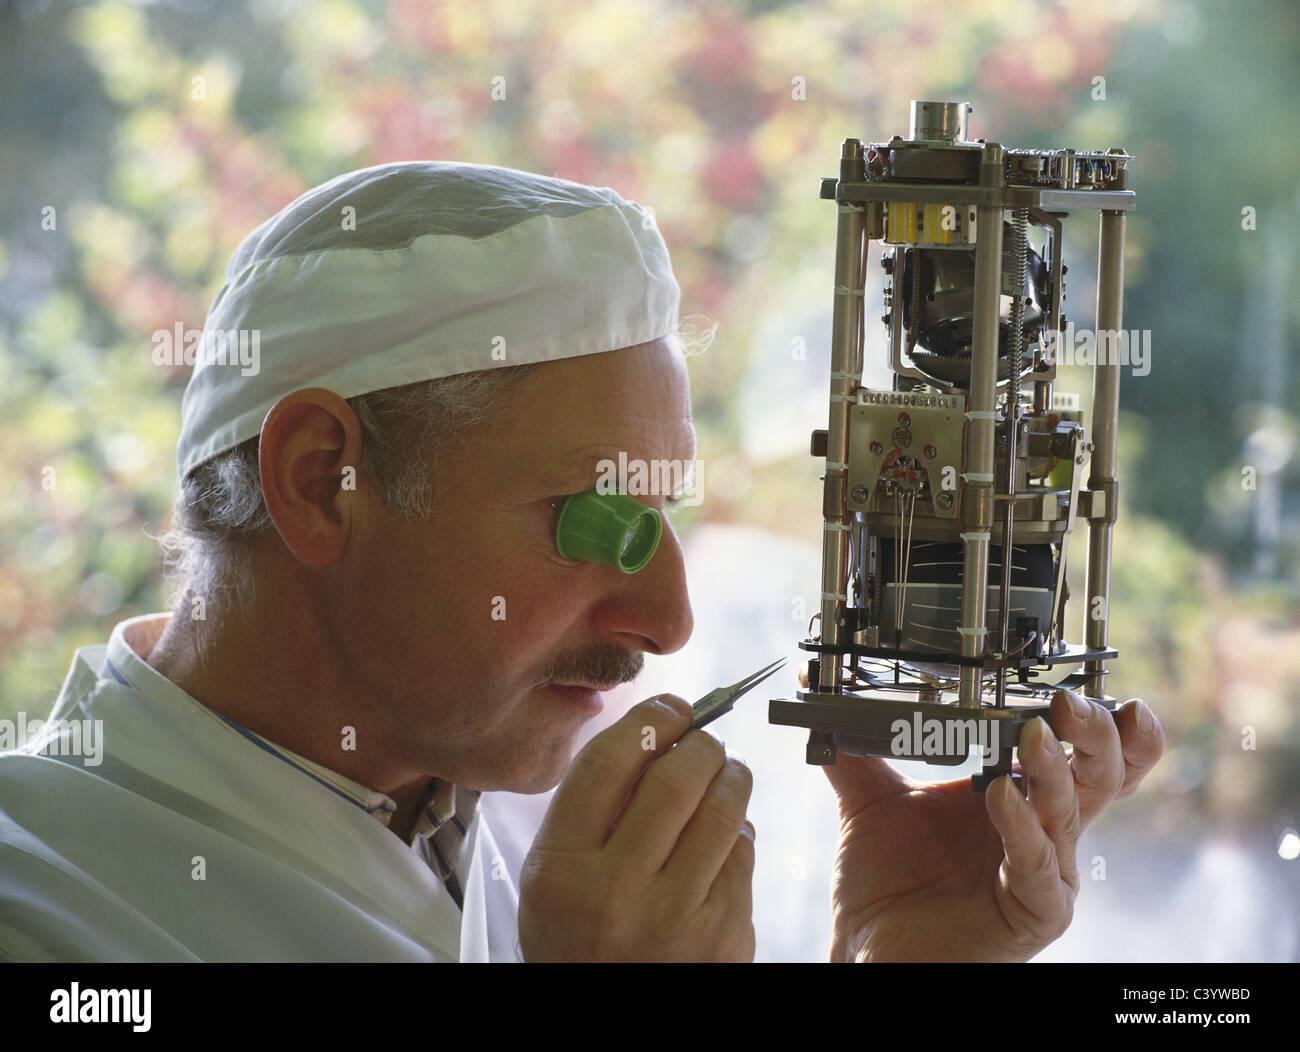 Adult, Aeronautics, Aeroplane, Aerospace, Aircraft, Assembling, Assembly, Aviation, Caucasian, Constructing, Construction, - Stock Image